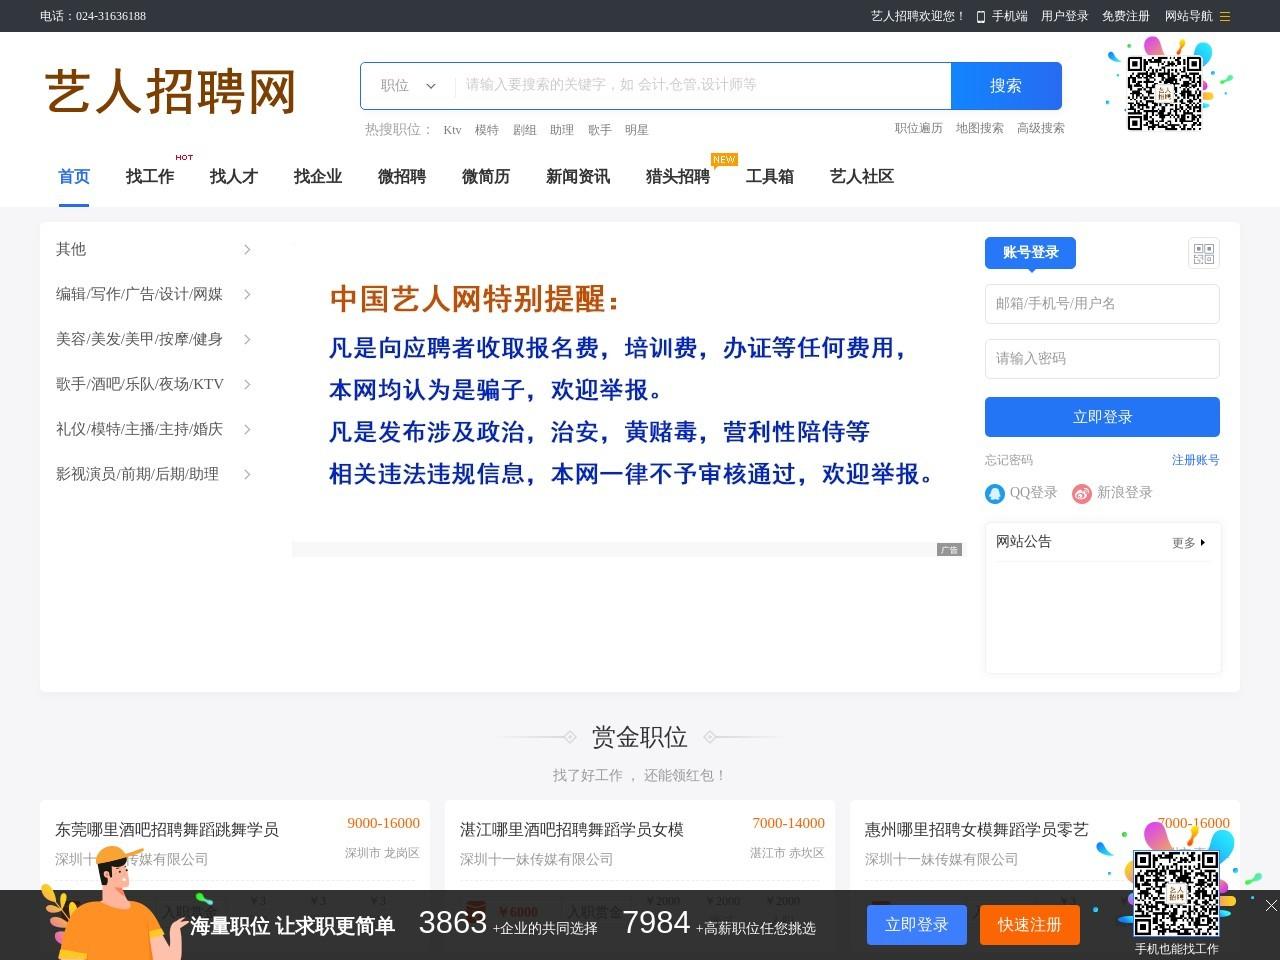 艺人网(www.11job.com)